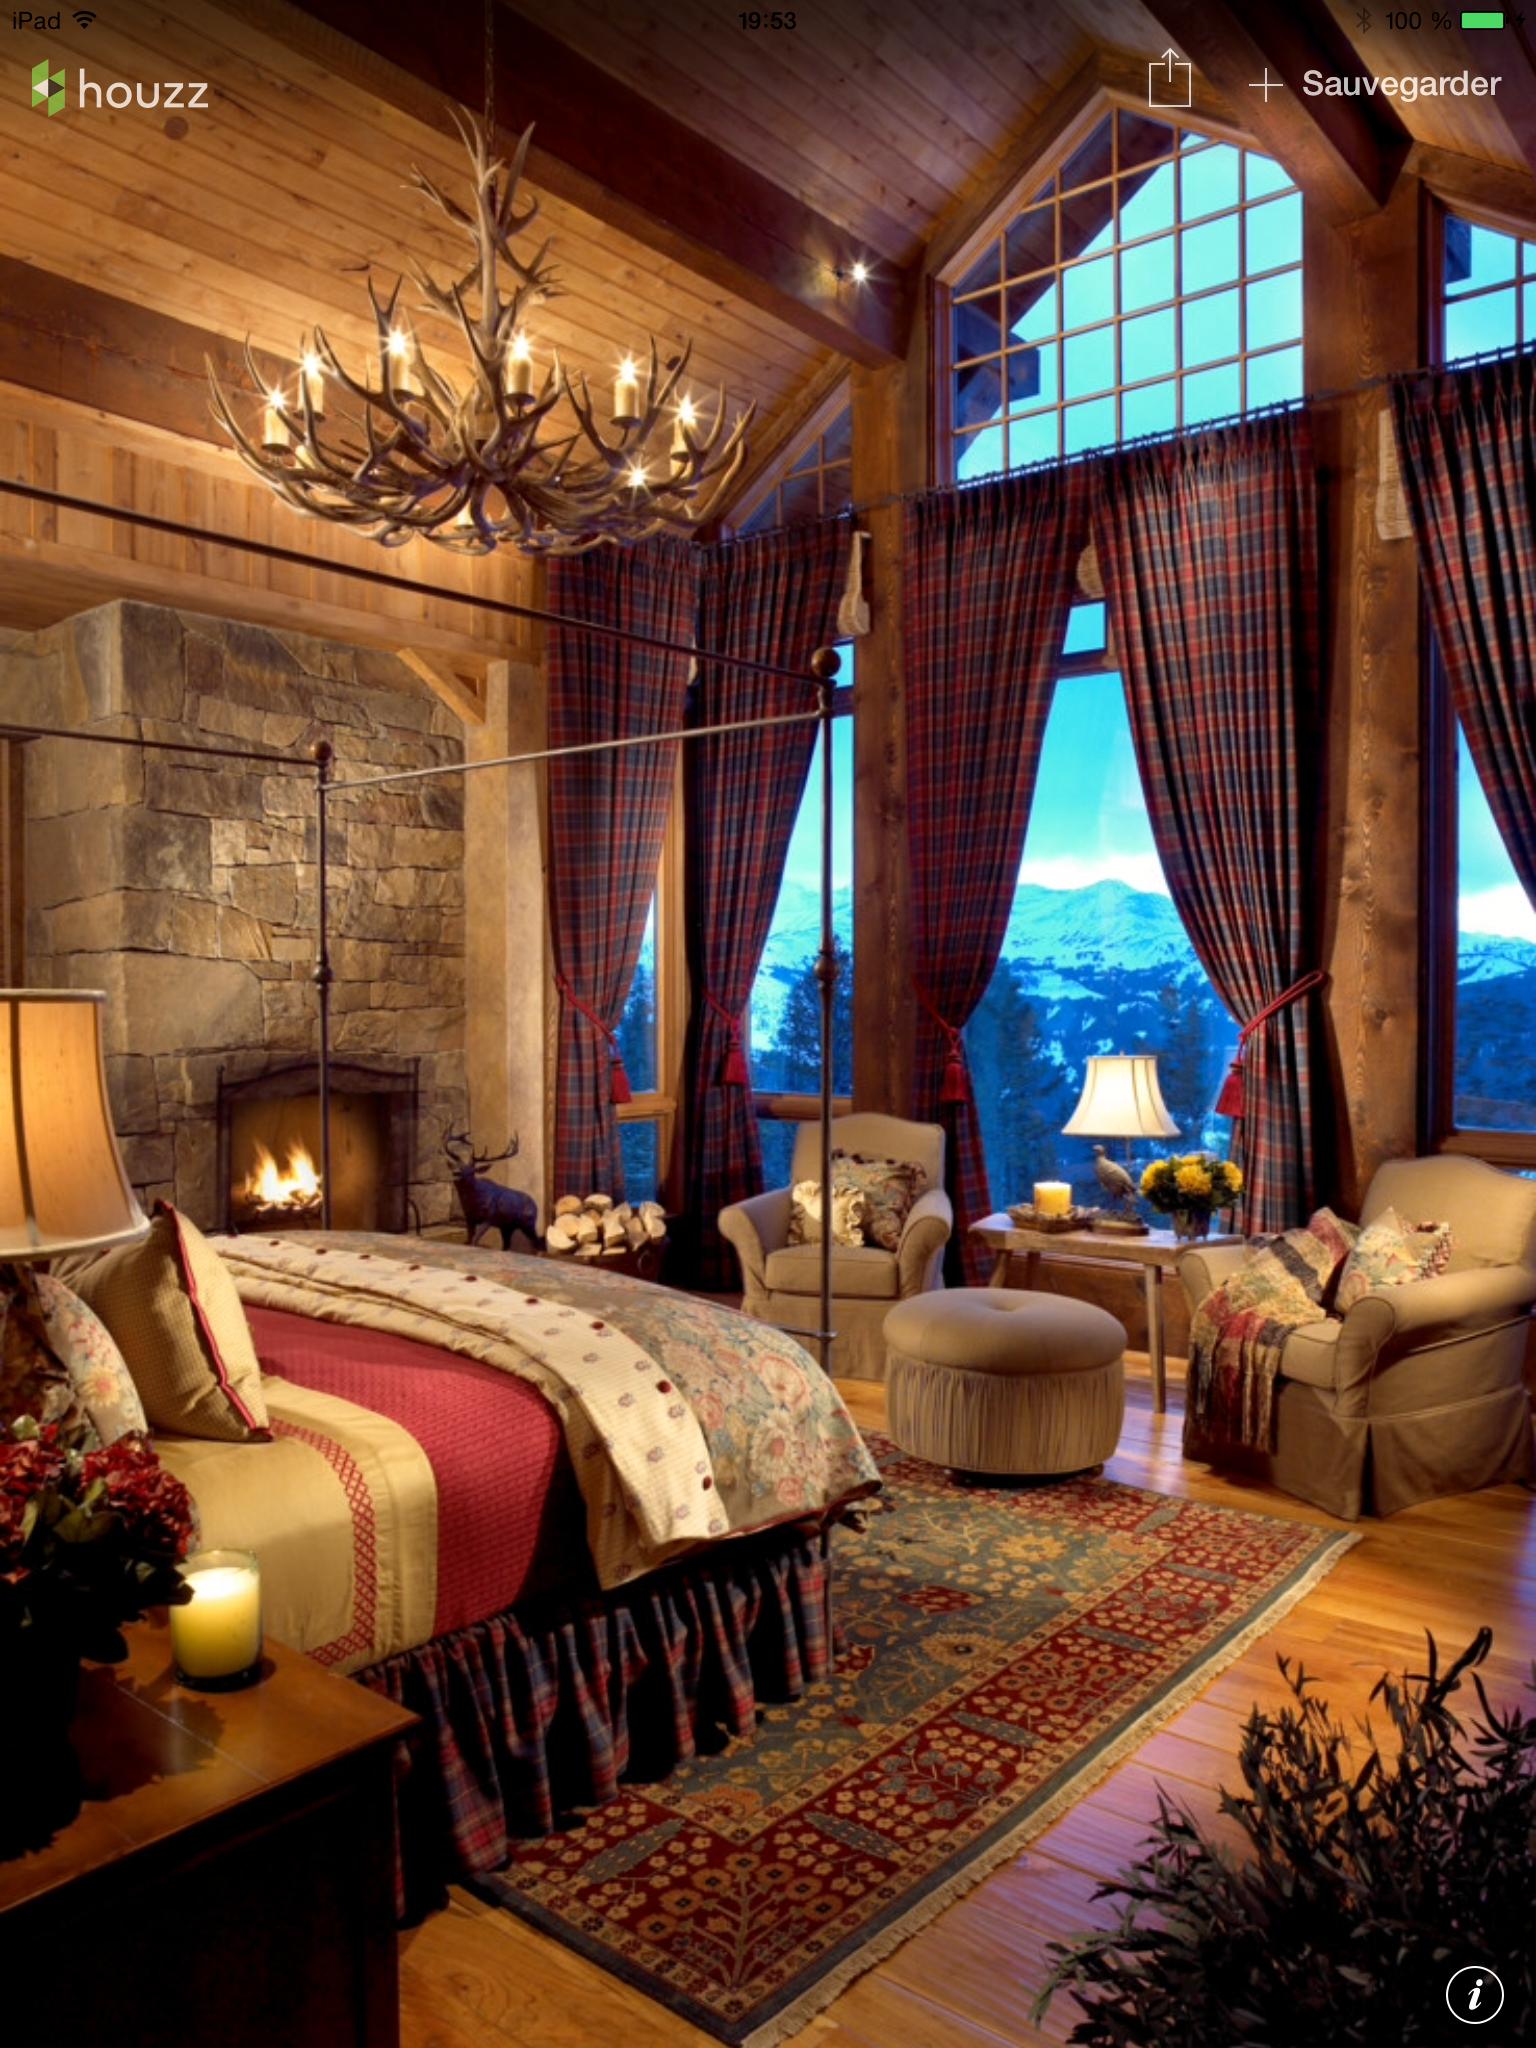 Stunning view classy cabin Log home bedroom, Log cabin